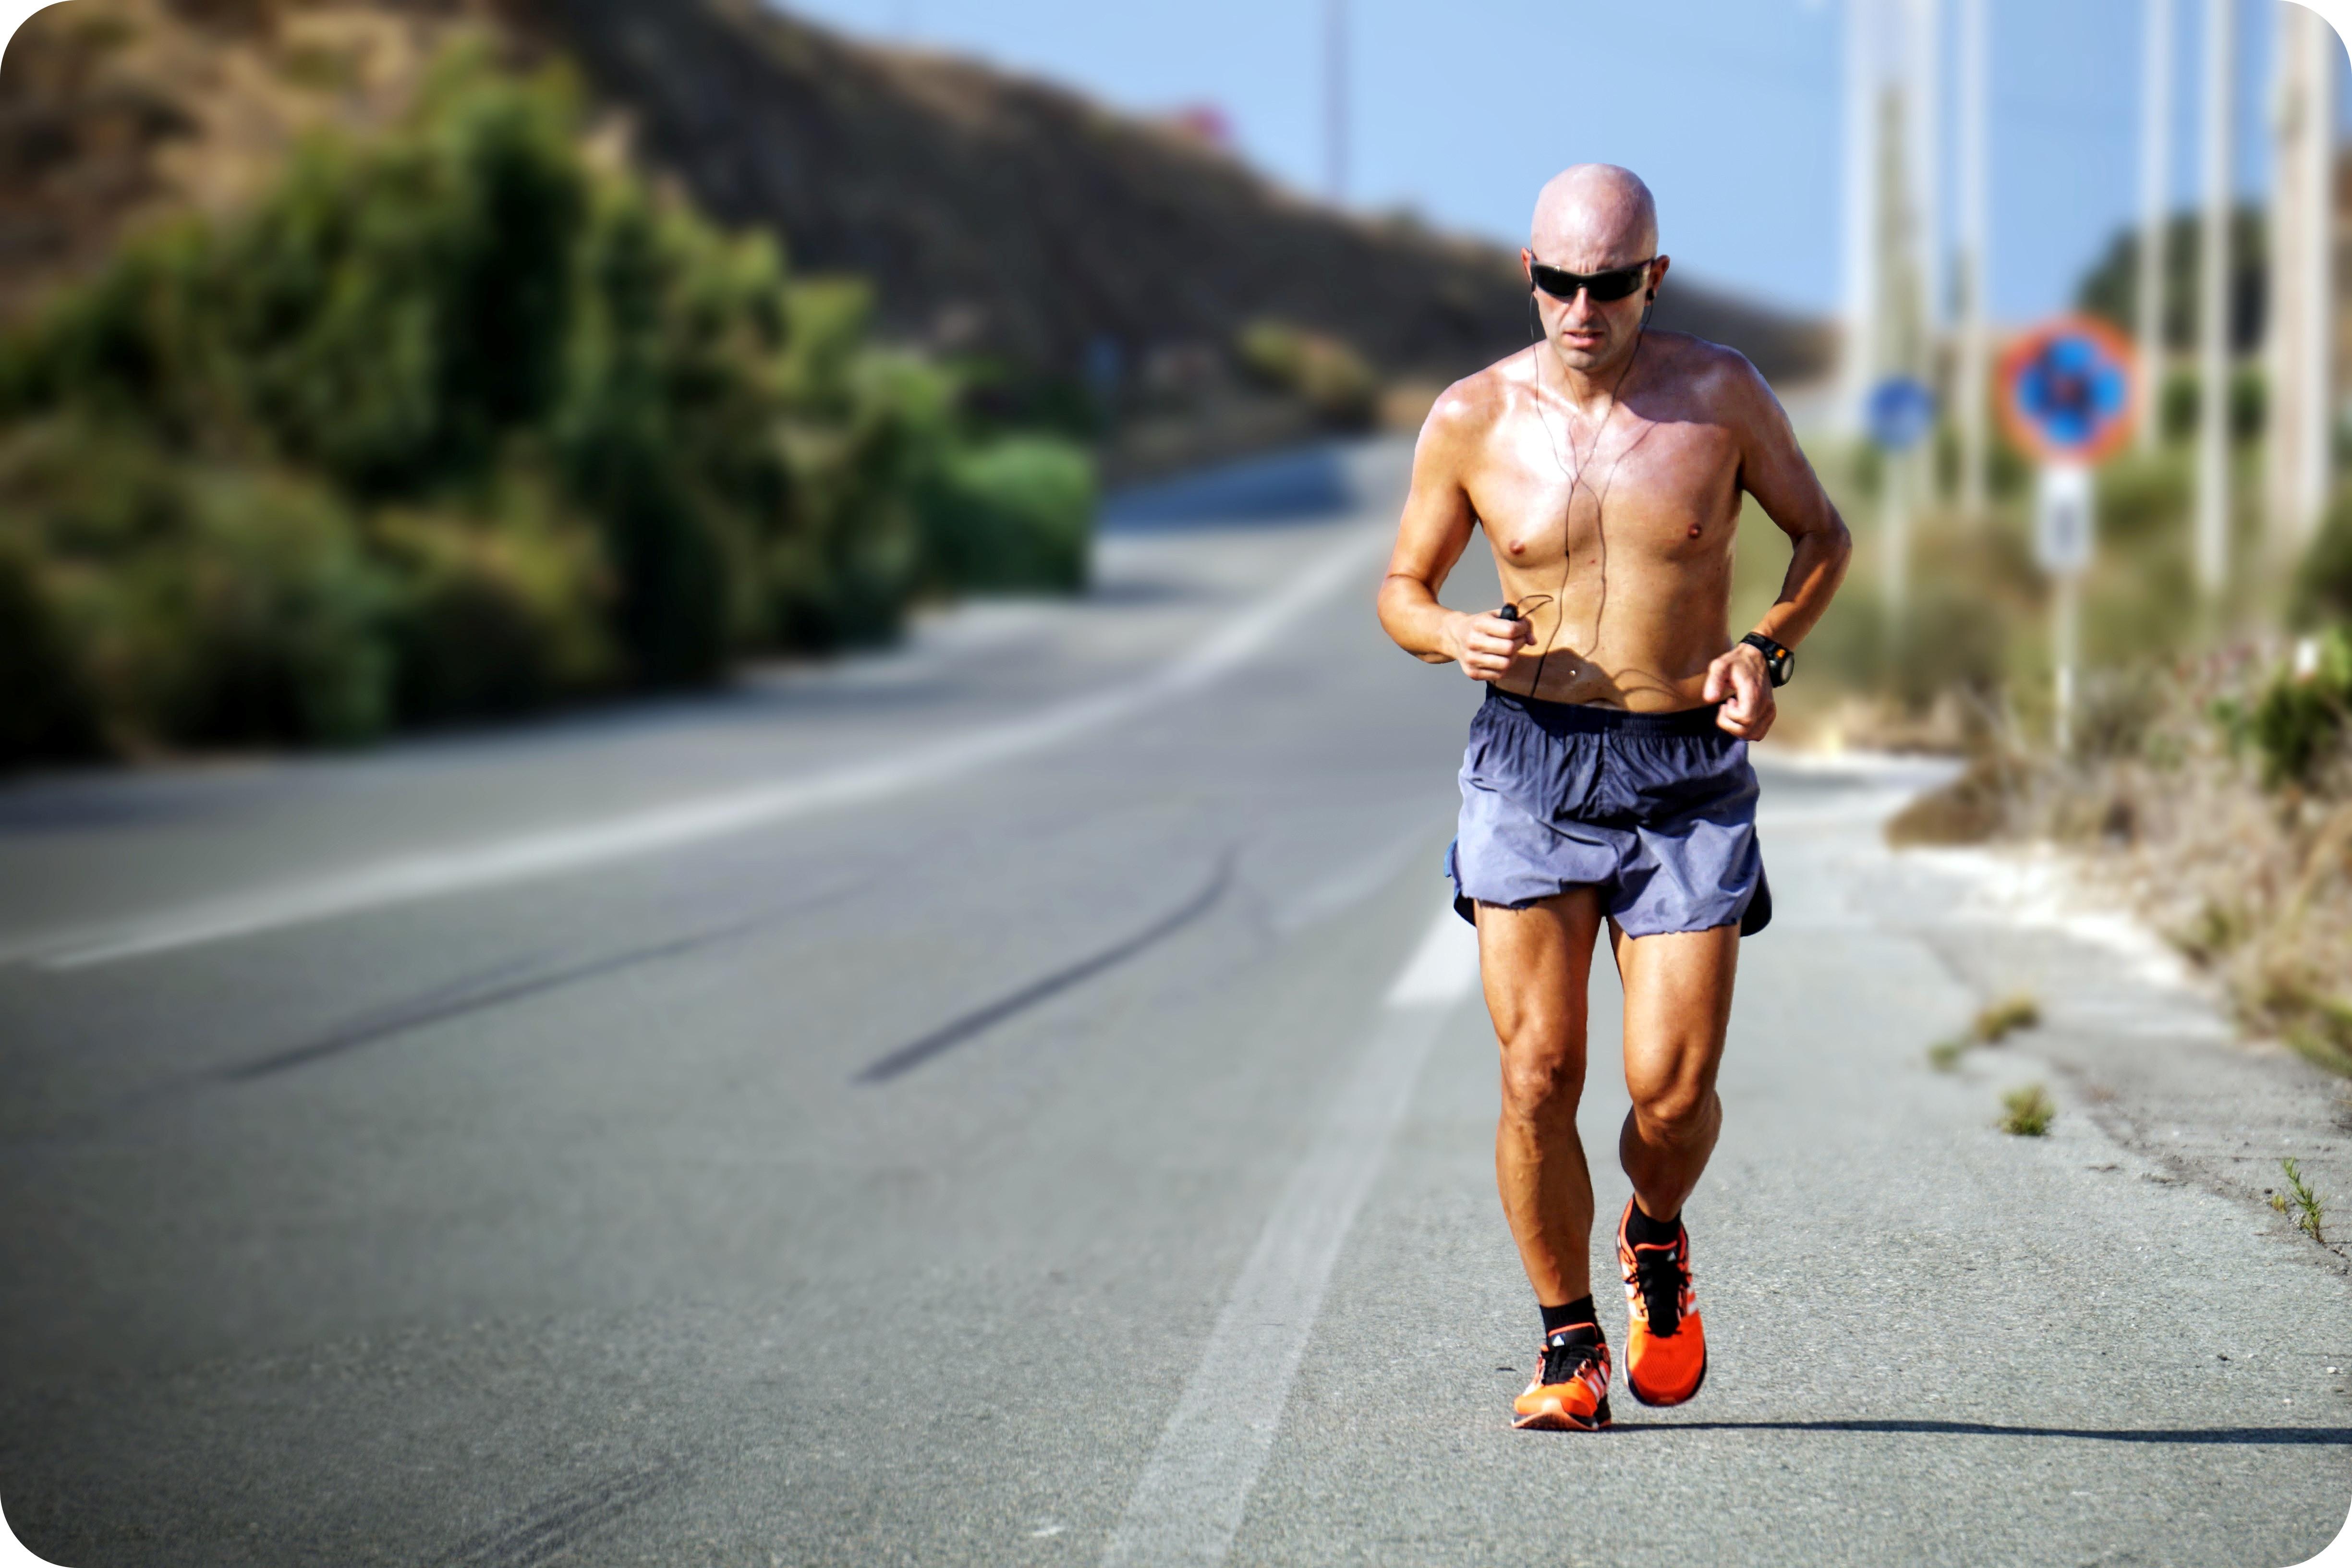 SIŁOWNIA: Jak rozpocząć trening? (fot. unsplash.com)